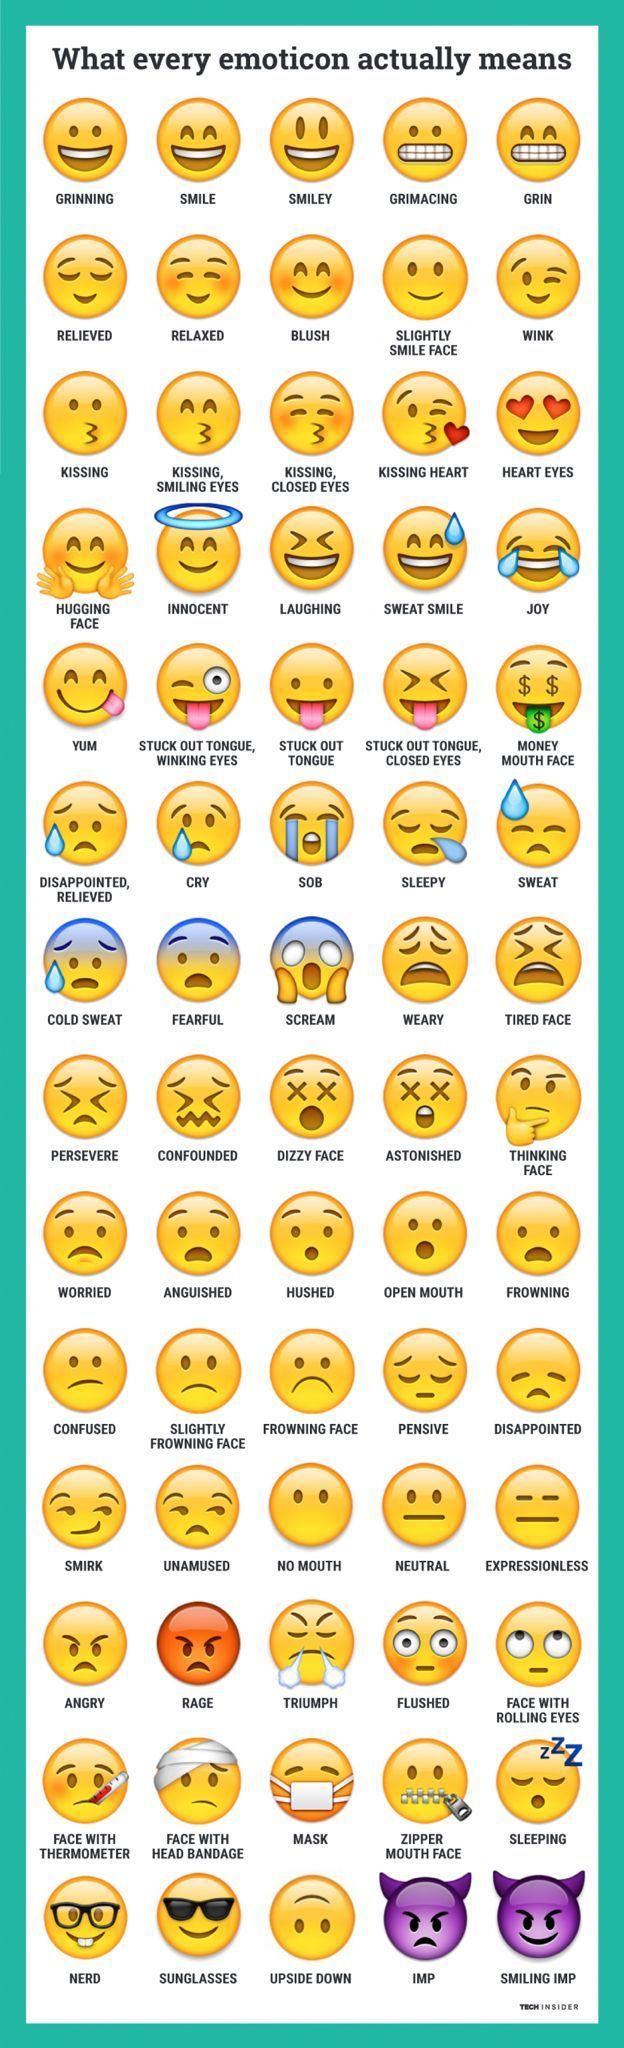 3b10f7724a8acc82d8265d9df01e95a7 Jpg 624 2048 Different Emojis Emoji Defined Emoji